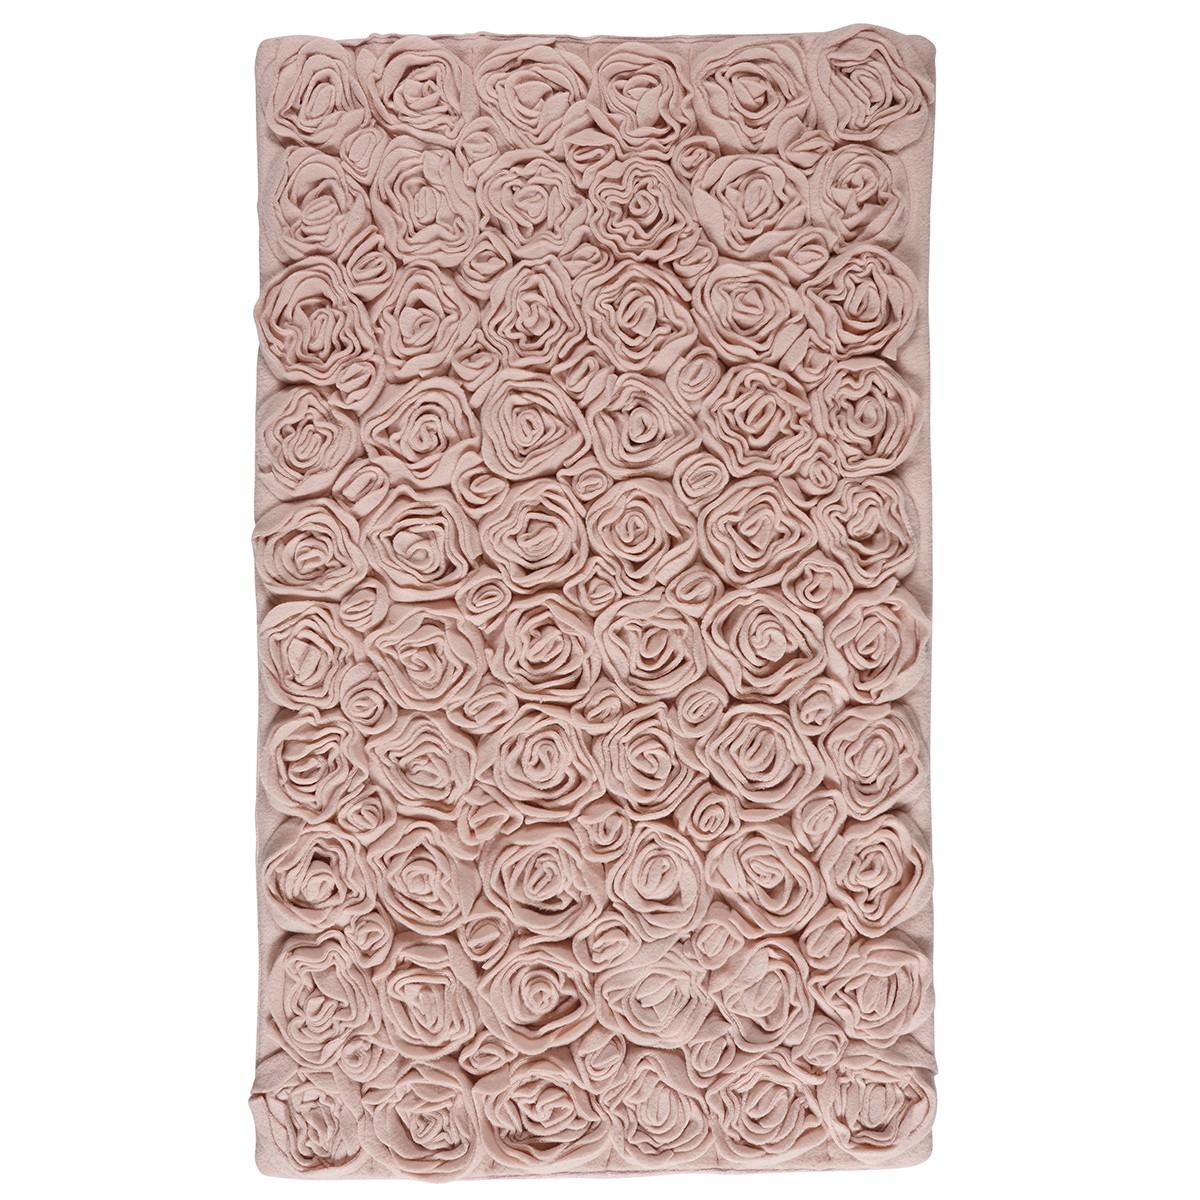 badteppich rose aquanova pastellrosa. Black Bedroom Furniture Sets. Home Design Ideas